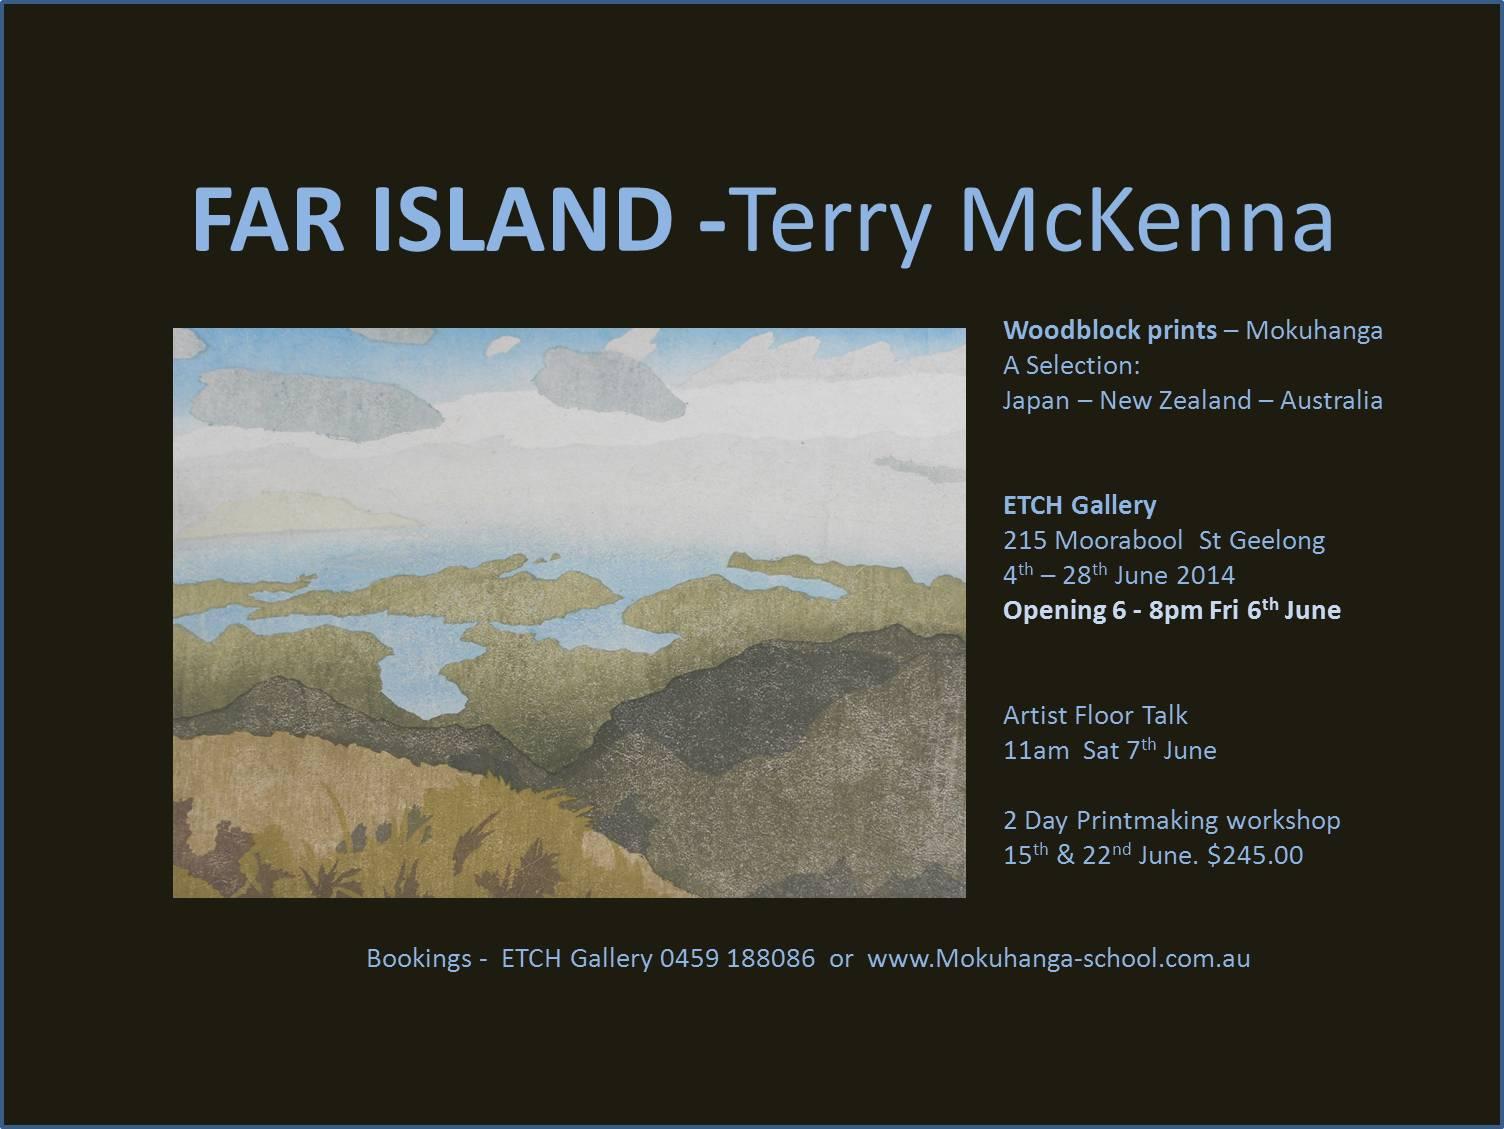 'Far Island' Terry McKenna Invite